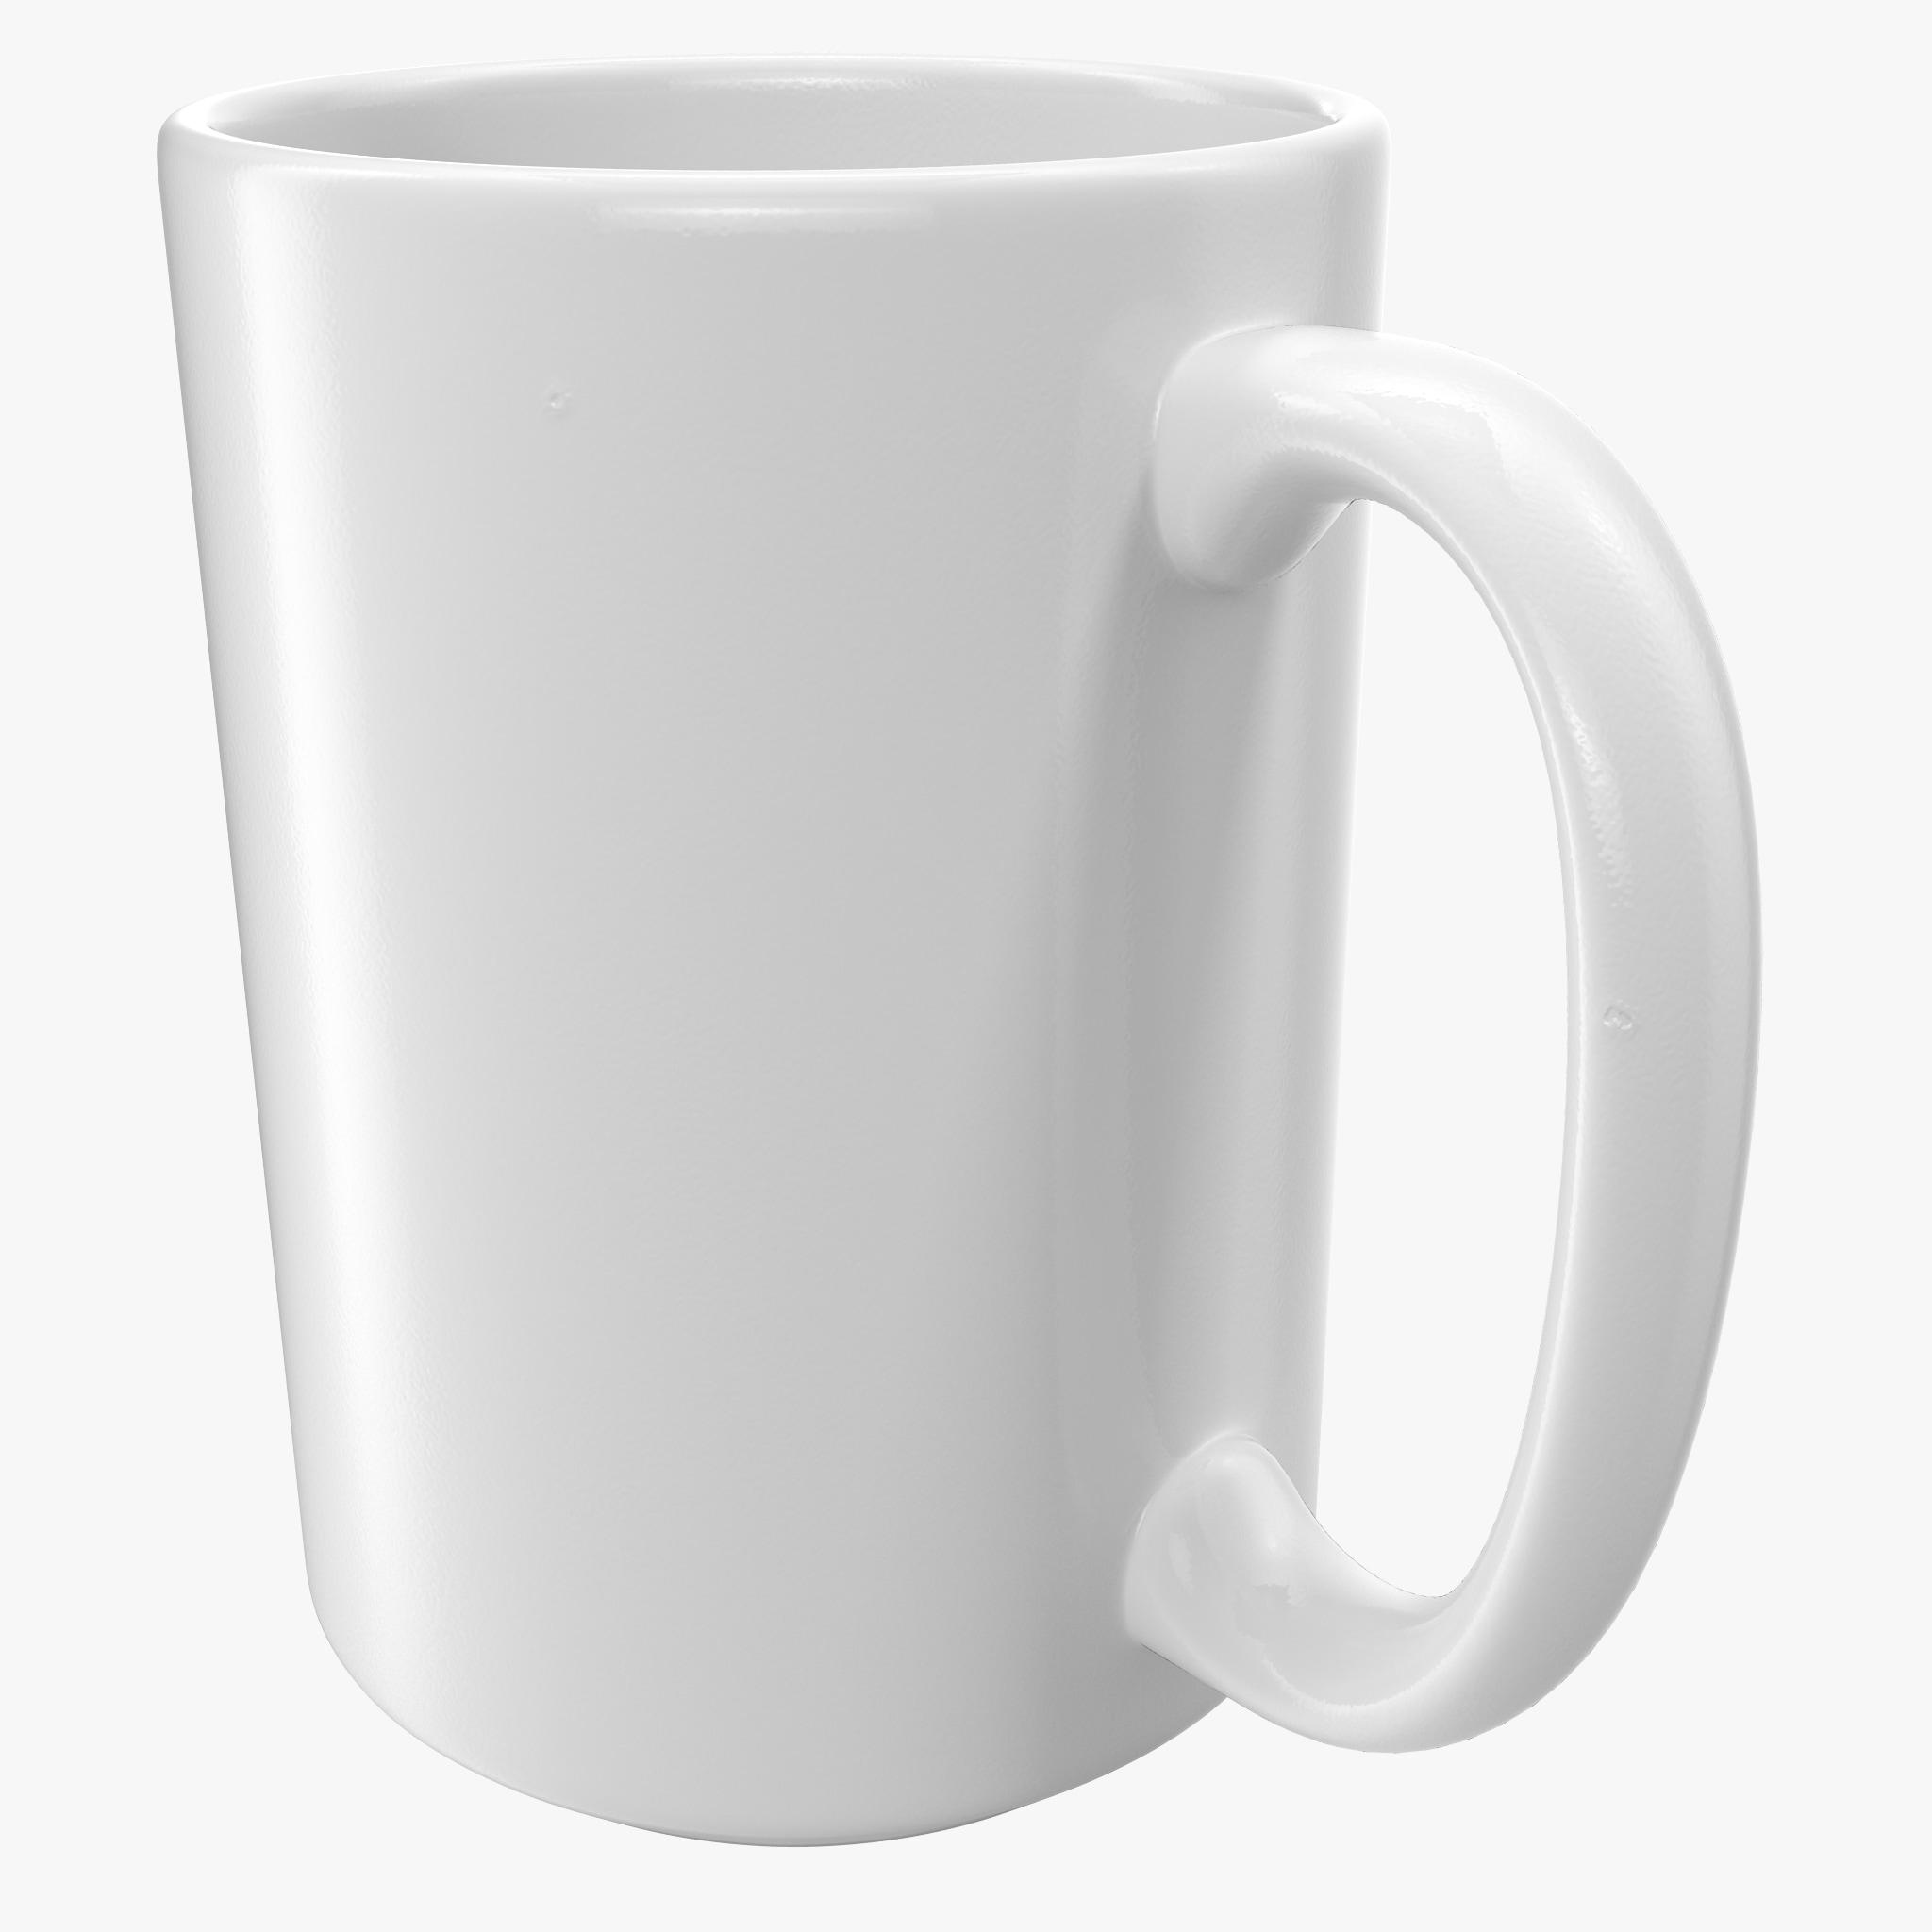 001_Coffee_mug.jpg